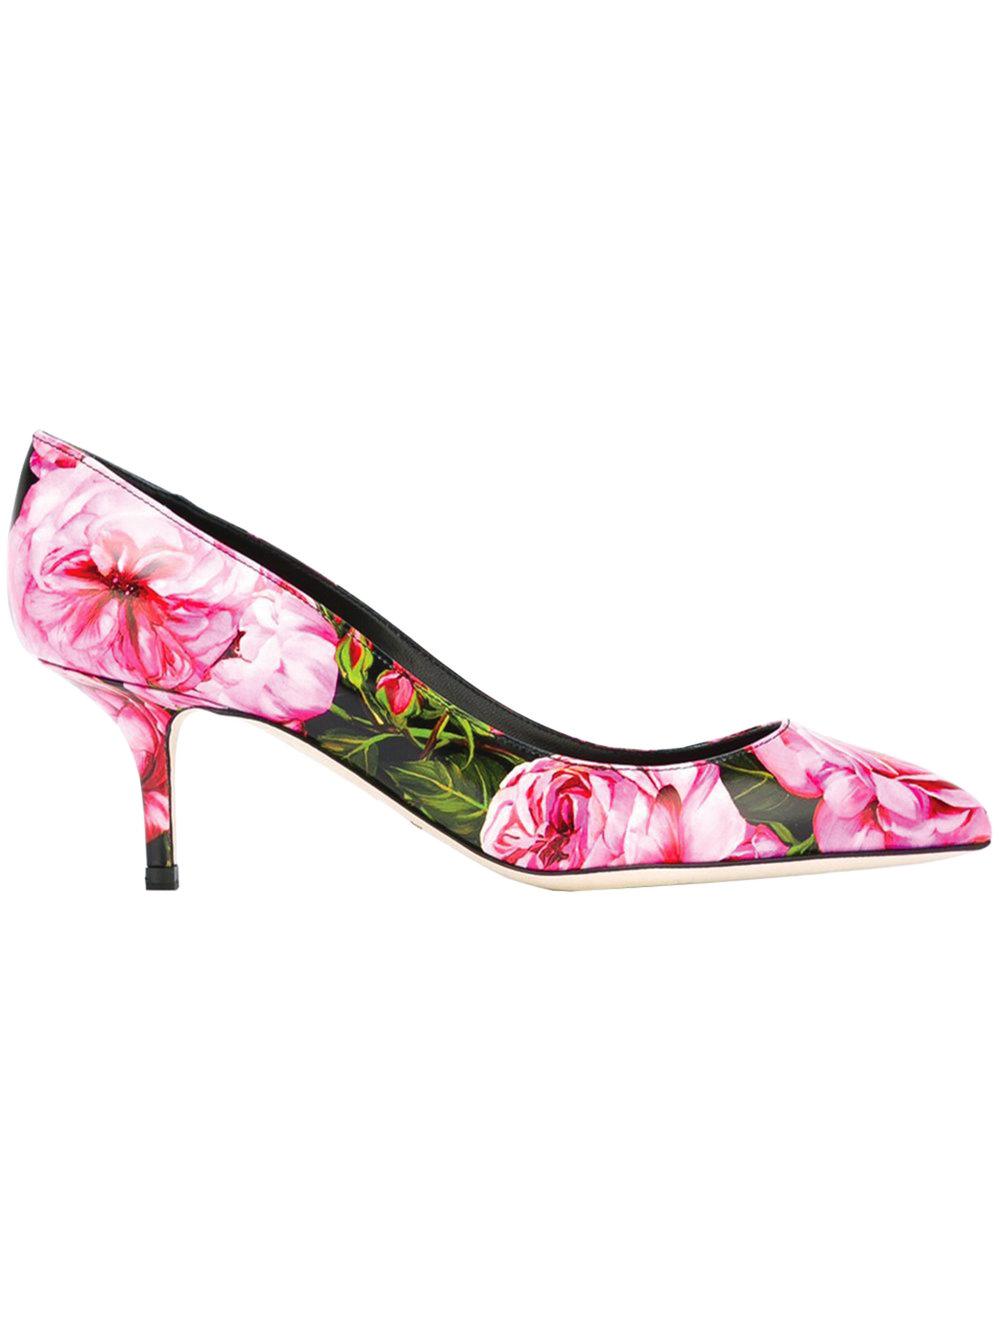 9.Camellia Print Pumps by Dolce & Gabbana 高跟鞋 $1,014, farfetch.ca